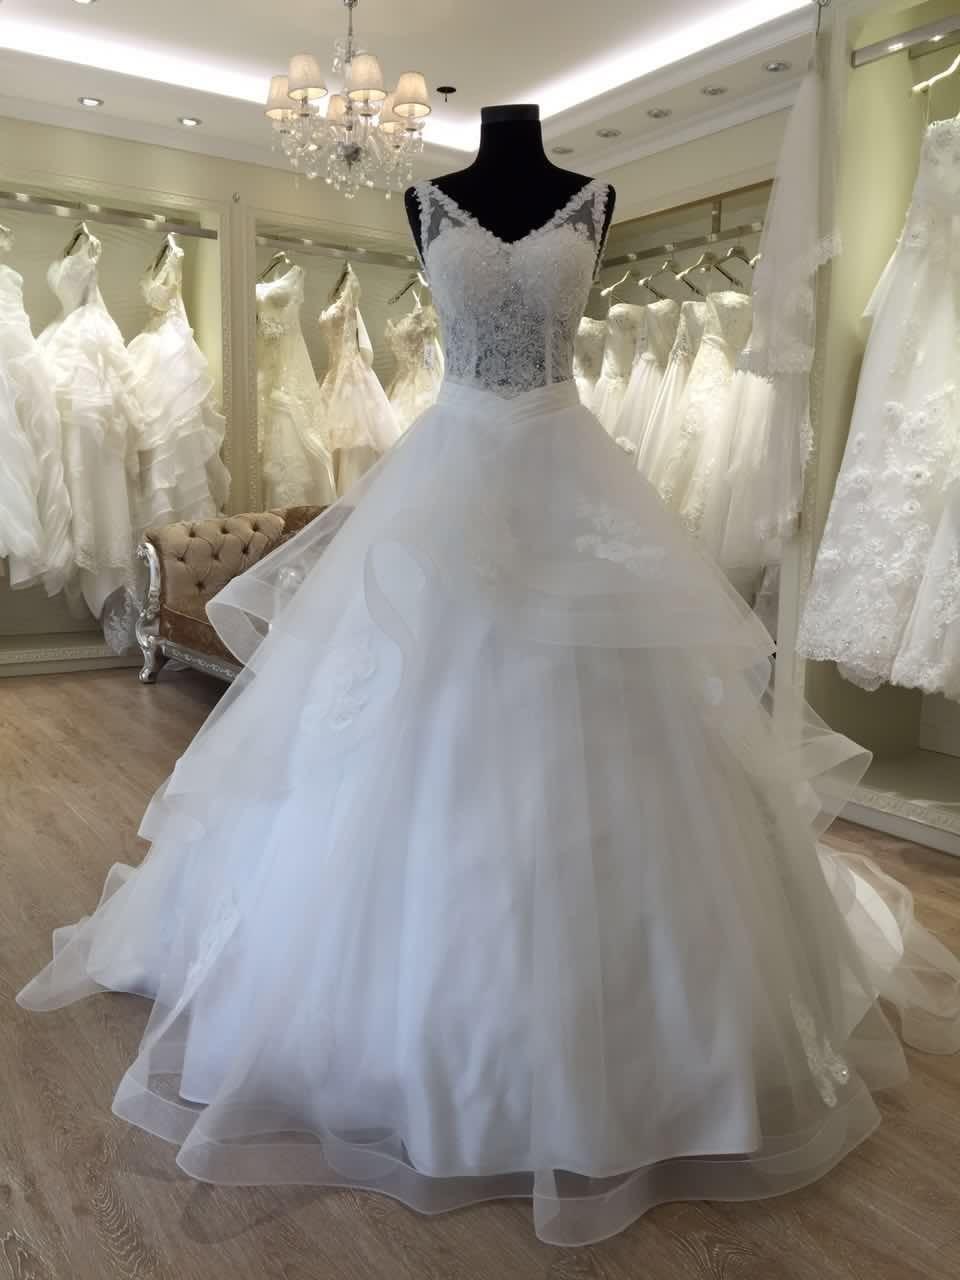 Belle Princesse Col En V Robes De Mariée En Turquie Istanbul Buy Robes De Mariée Turquie Istanbulrobes De Mariée En Turquierobes De Mariée